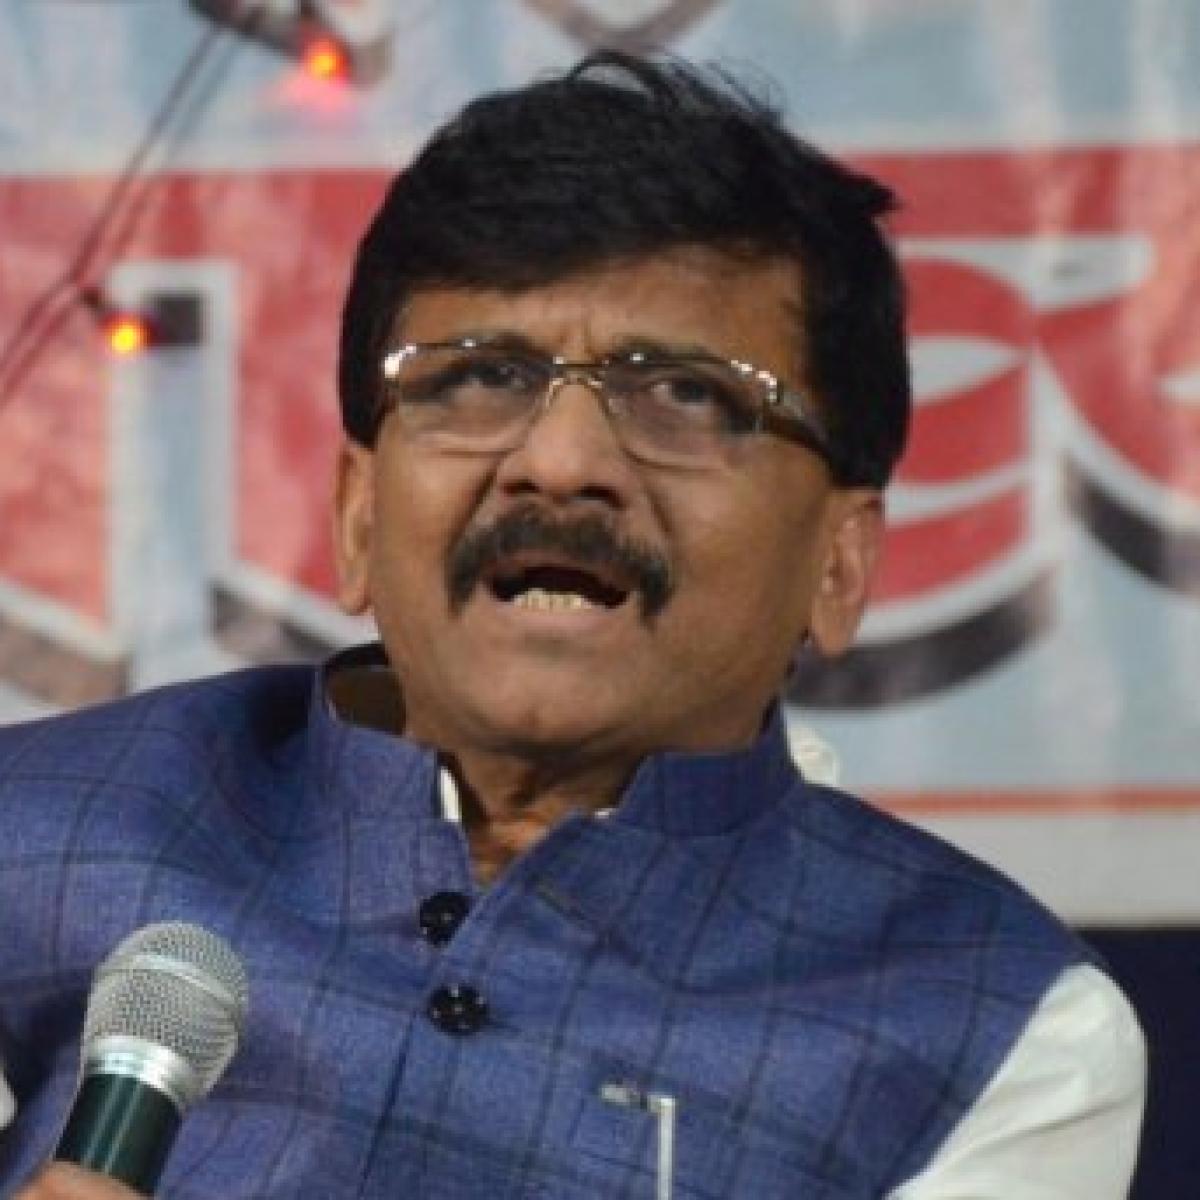 COVID-19: Situation in Uttar Pradesh is worrisome, says Sanjay Raut